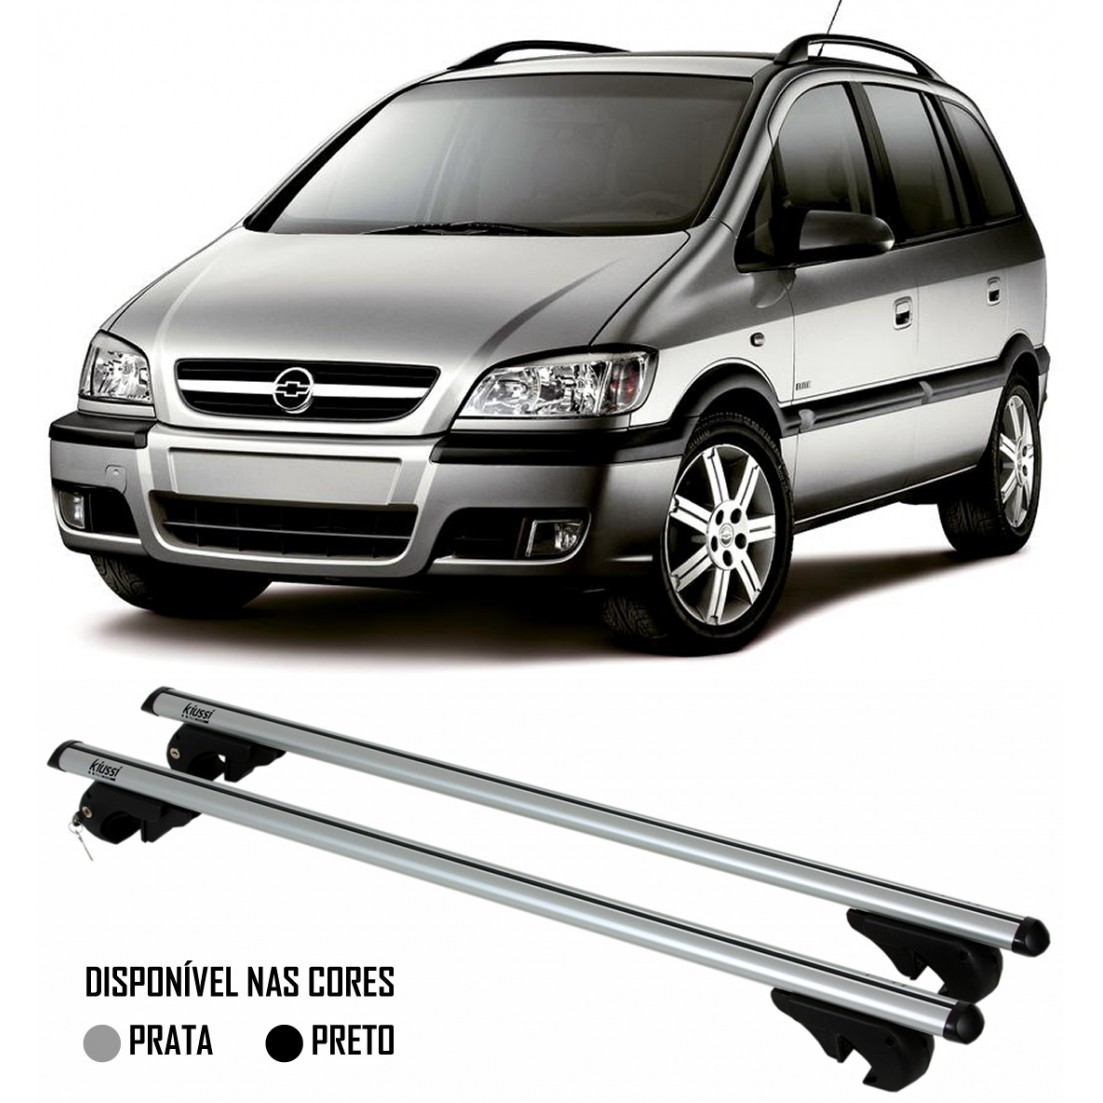 Rack Travessa Chevrolet Zafira 1998 À 2012 Com Longarina - Kiussi Belluno 117cm Alumínio Com Chave 50KG - Preto / Prata